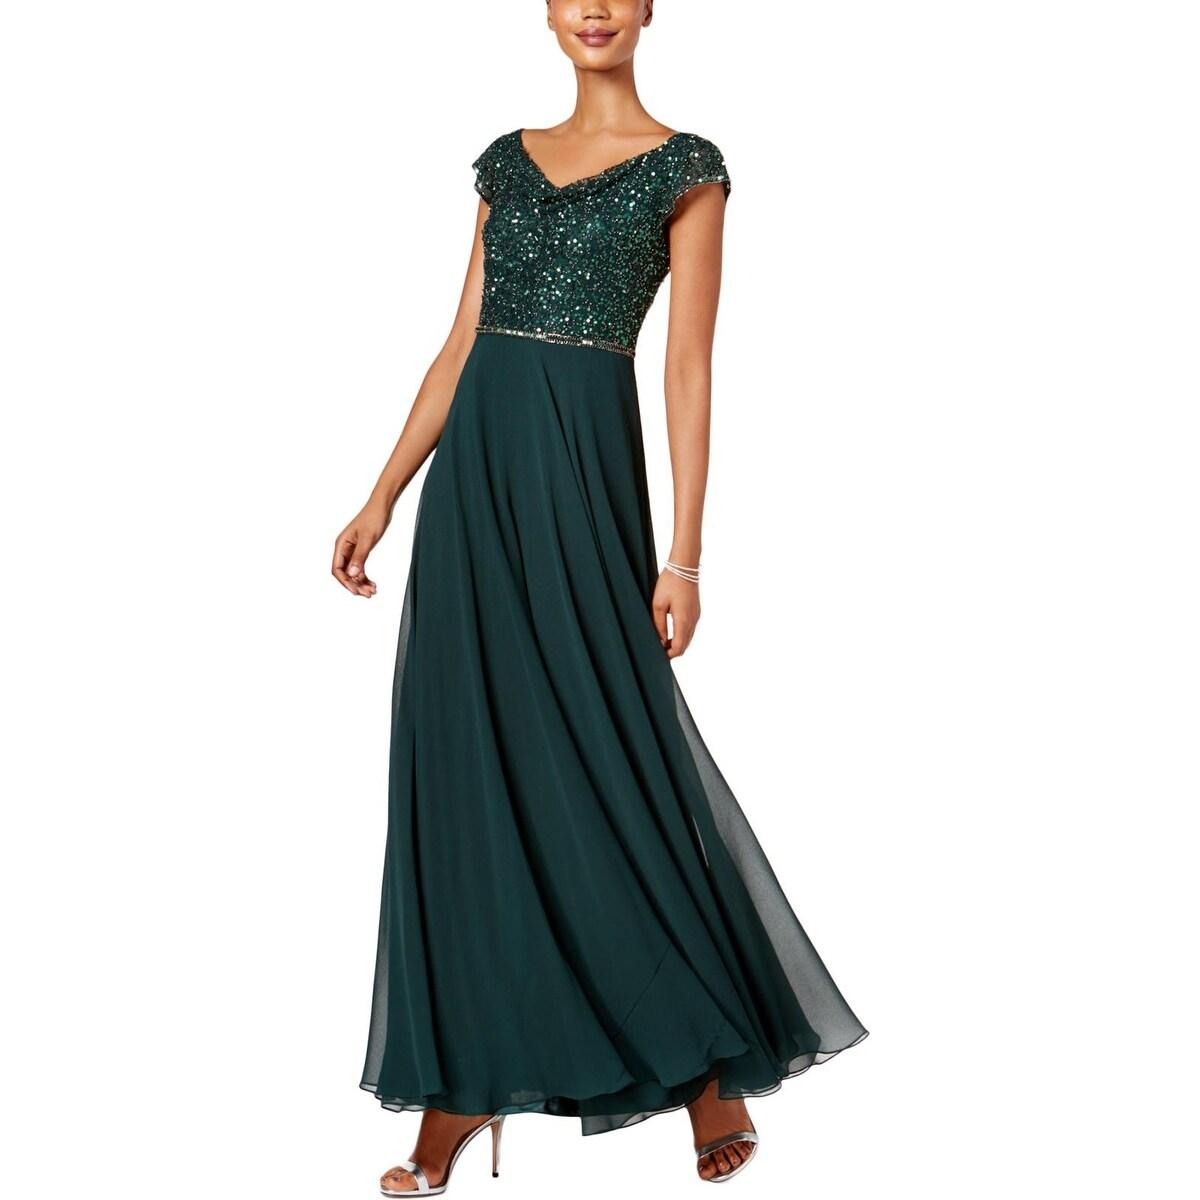 5d8ac86f568 Shop J Kara Womens Mother of the Bride Dress Chiffon Embellished - 6 ...